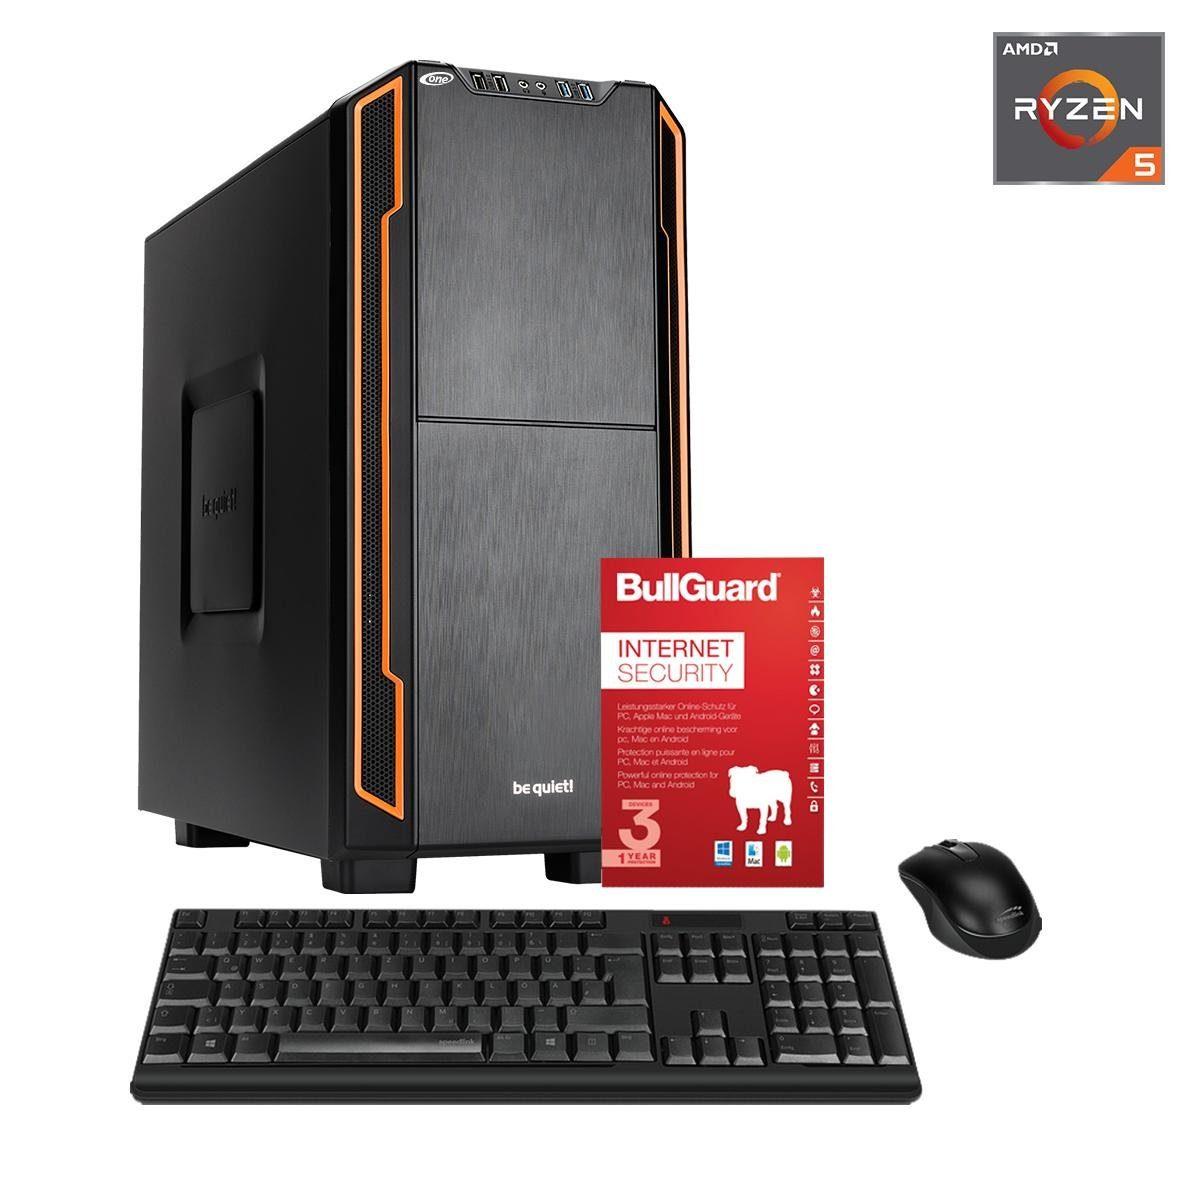 ONE PC, Ryzen 5 2600, GeForce GTX 1060, 8GB DDR4 RAM »PC 44702«